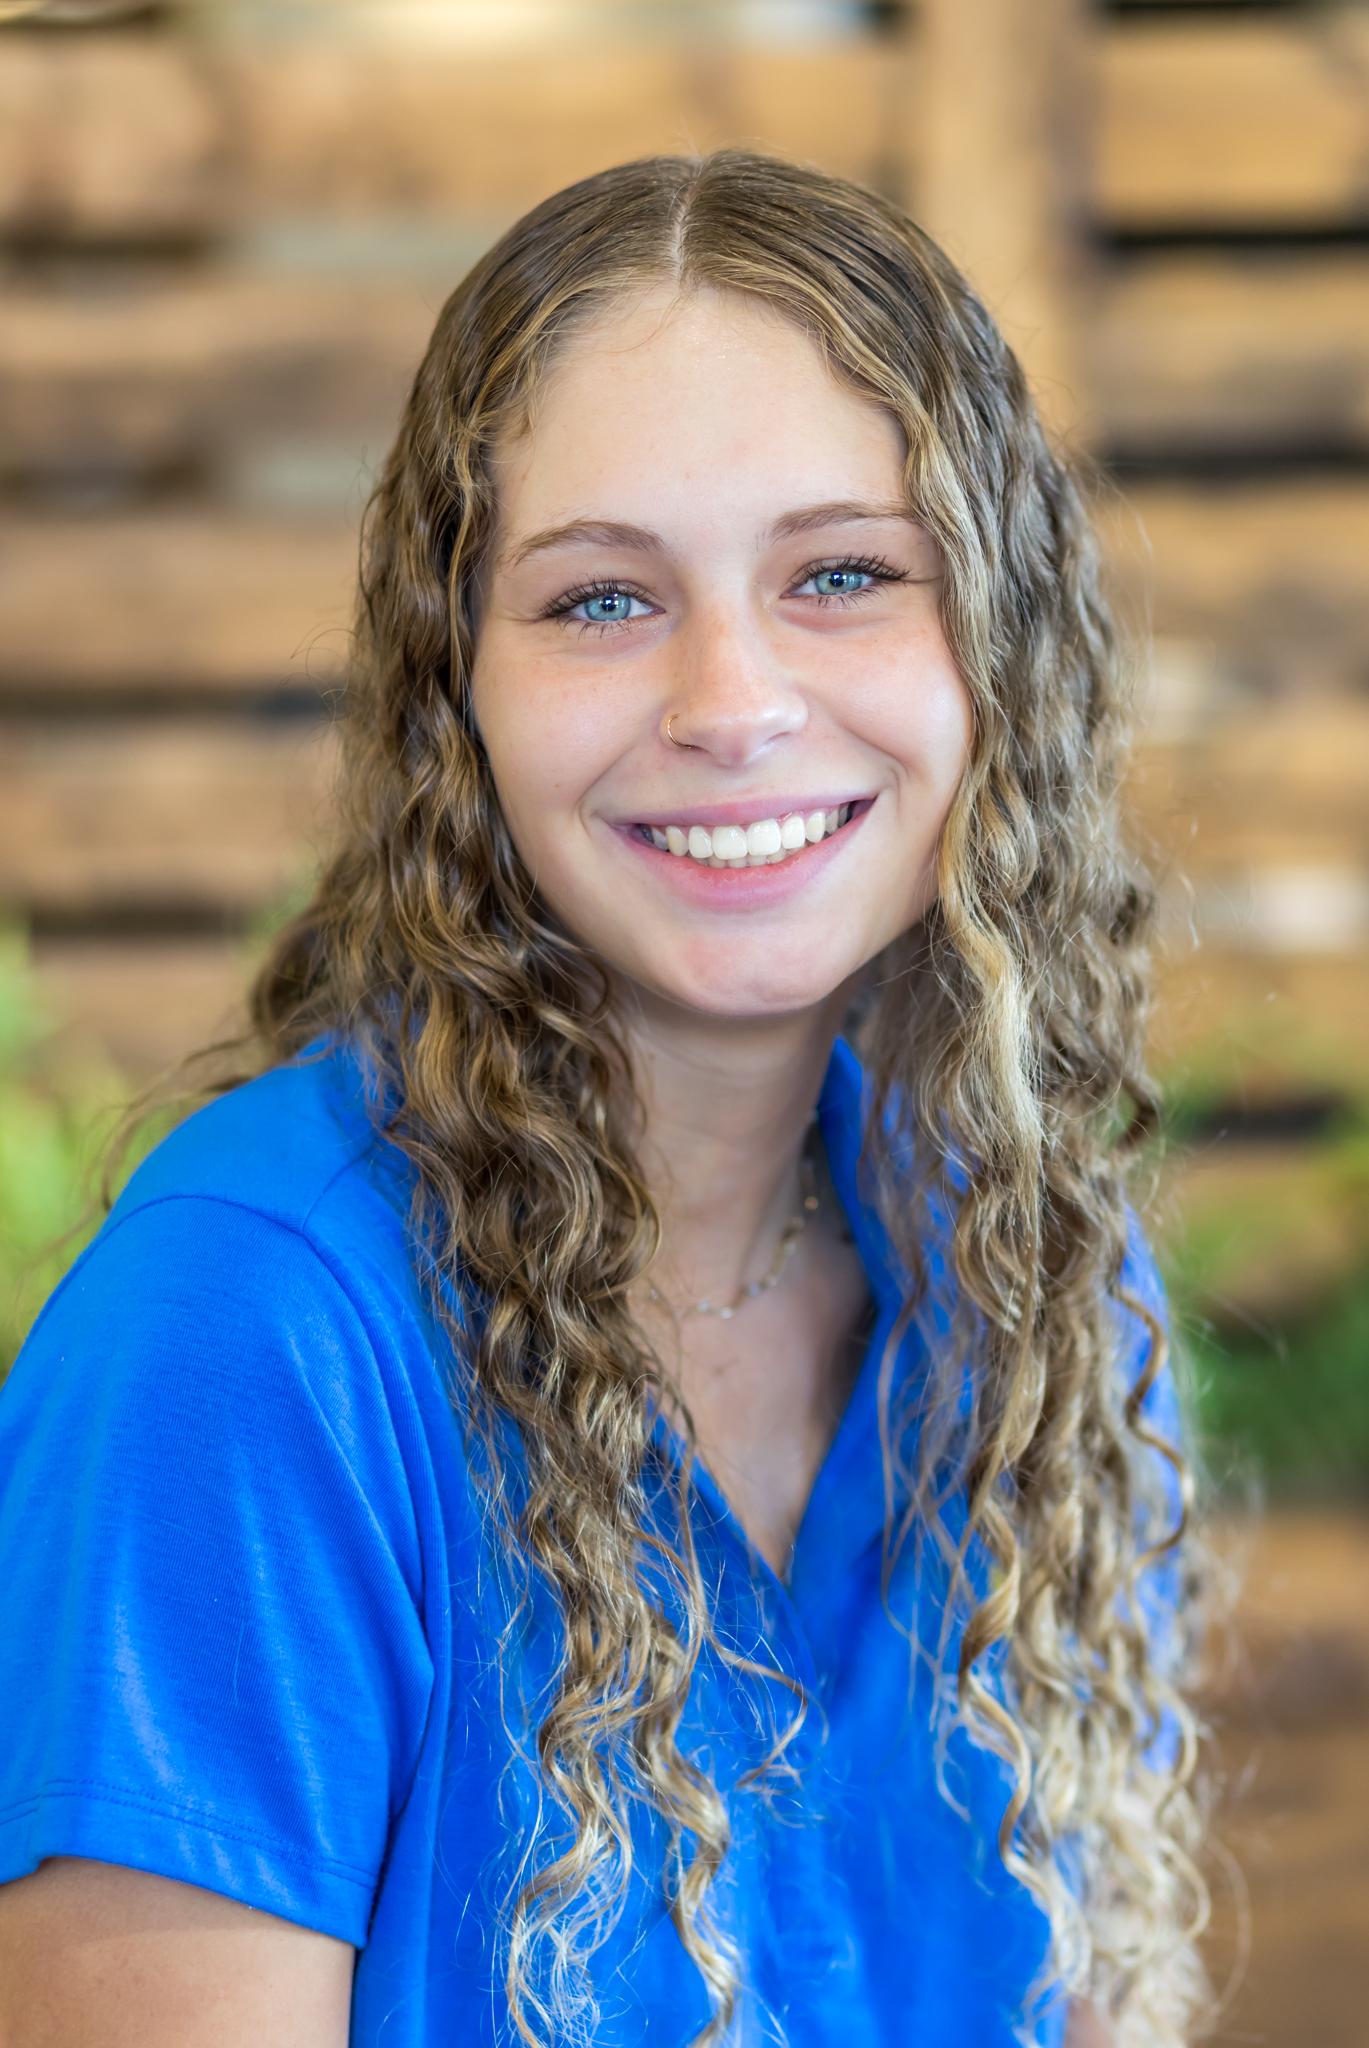 Hannah Tallian